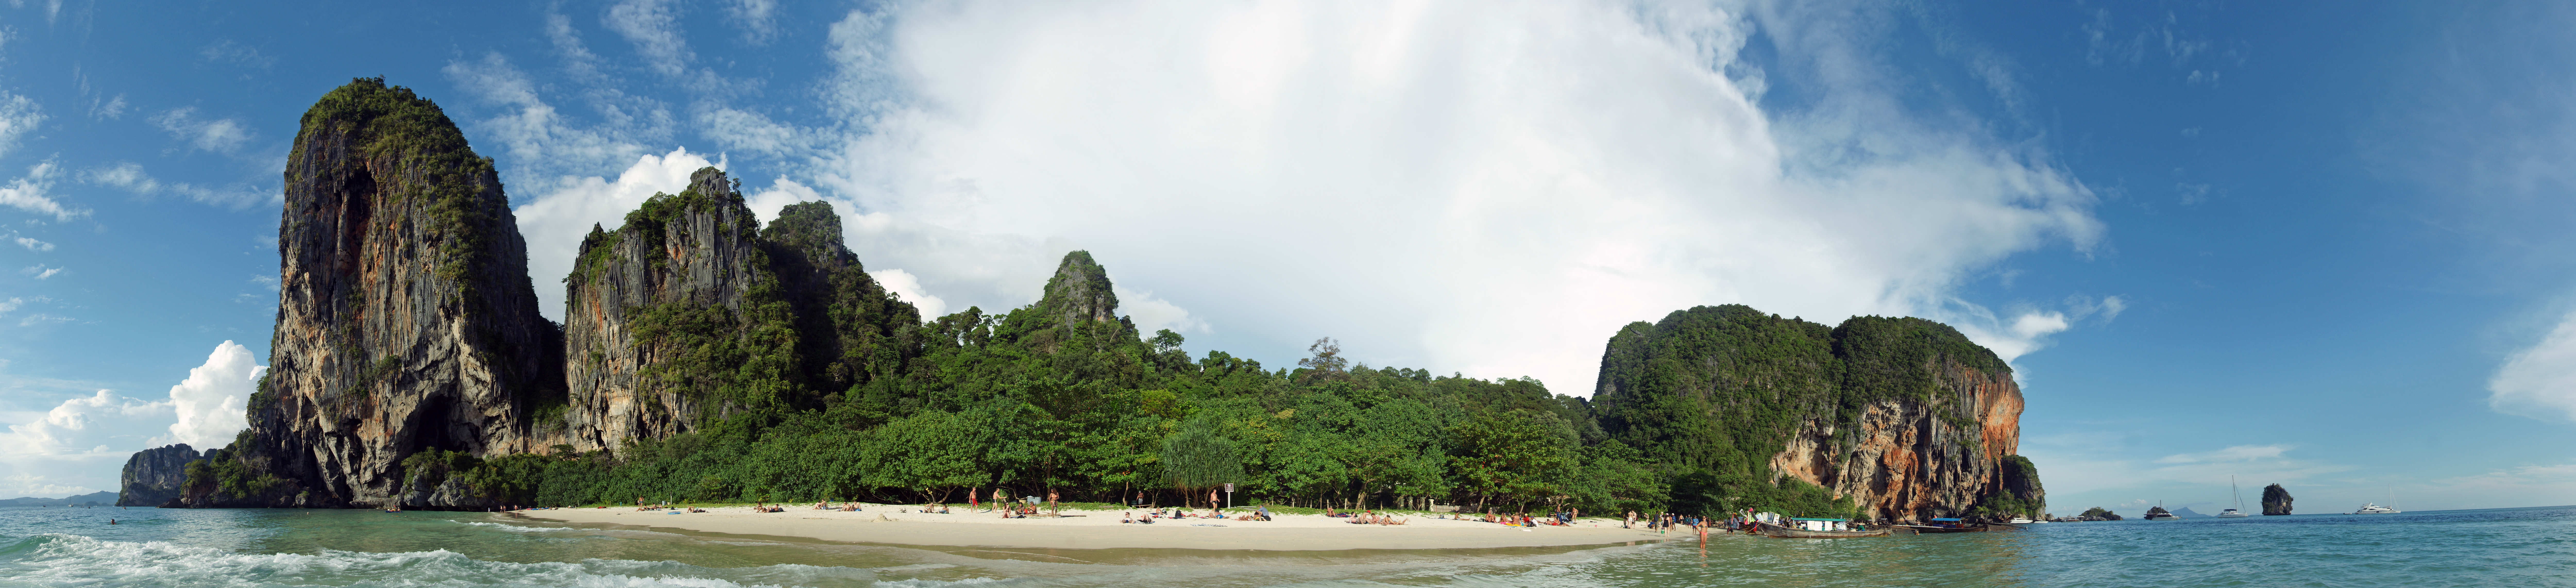 Phra_Nang_beach_panorama_2